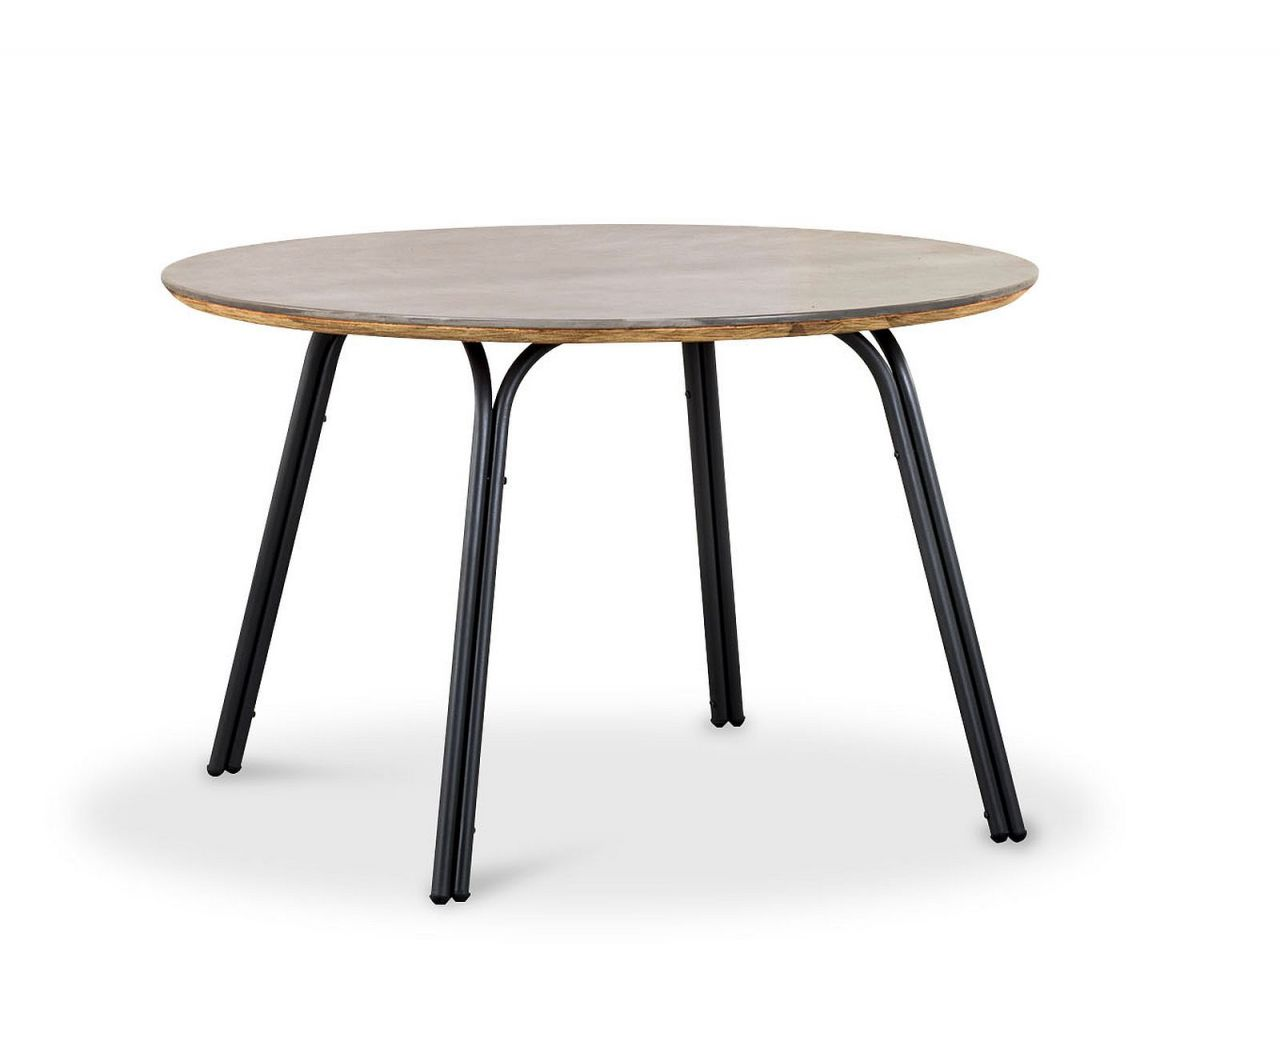 gartentisch 2 gr en rund 120 cm eckig 180 x 100 cm. Black Bedroom Furniture Sets. Home Design Ideas